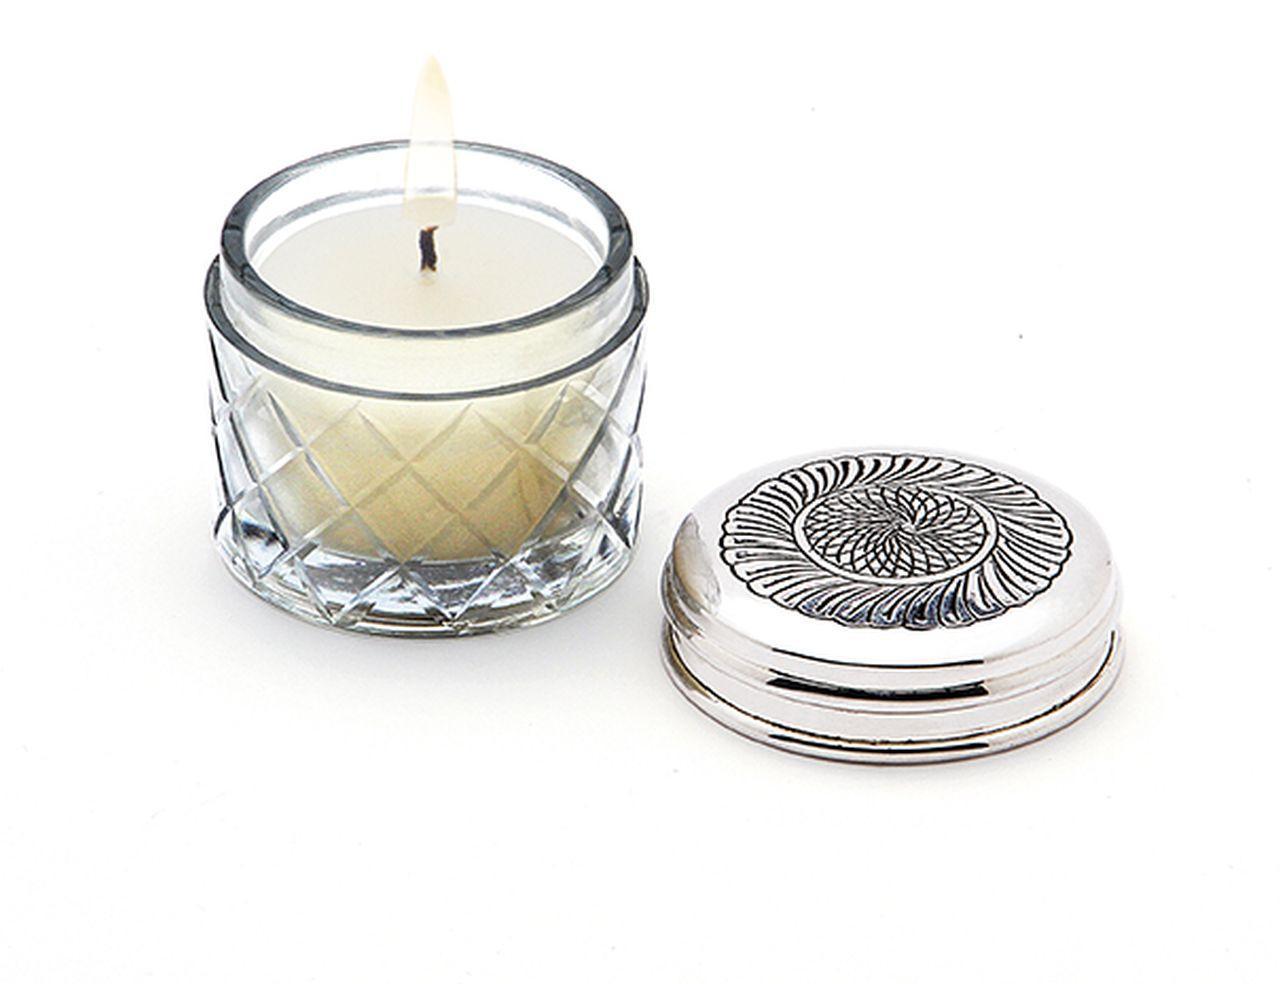 Porta candela stile cesellato argentato argento sheffield